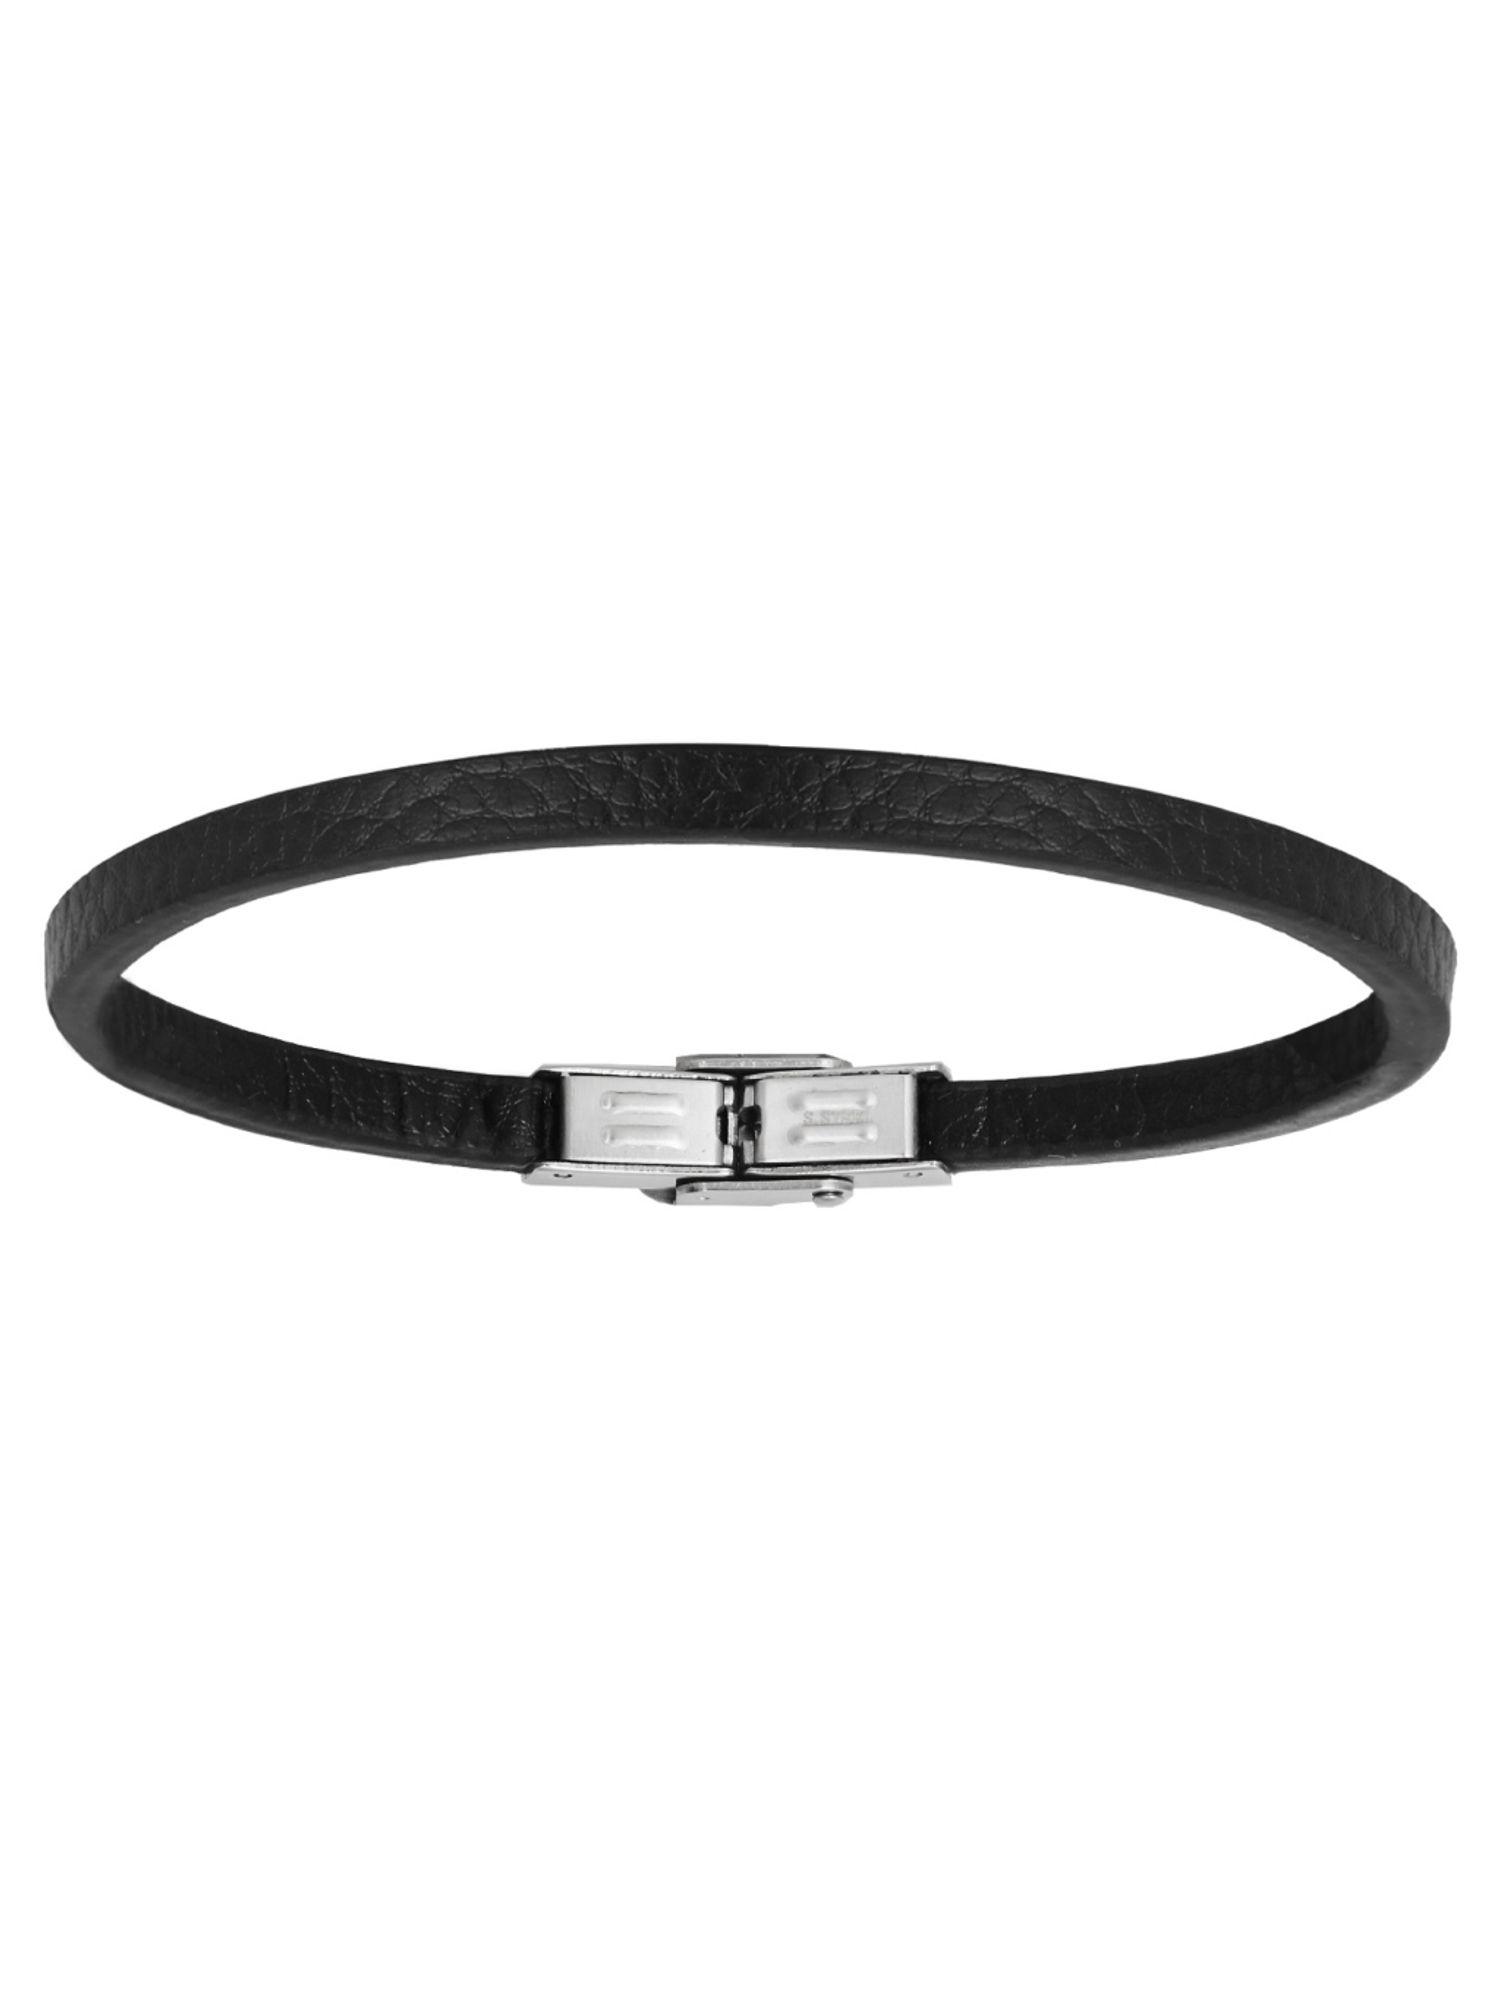 XENOX X4506 Herren Armband XENOX men Edelstahl Silber Schwarz 22 cm